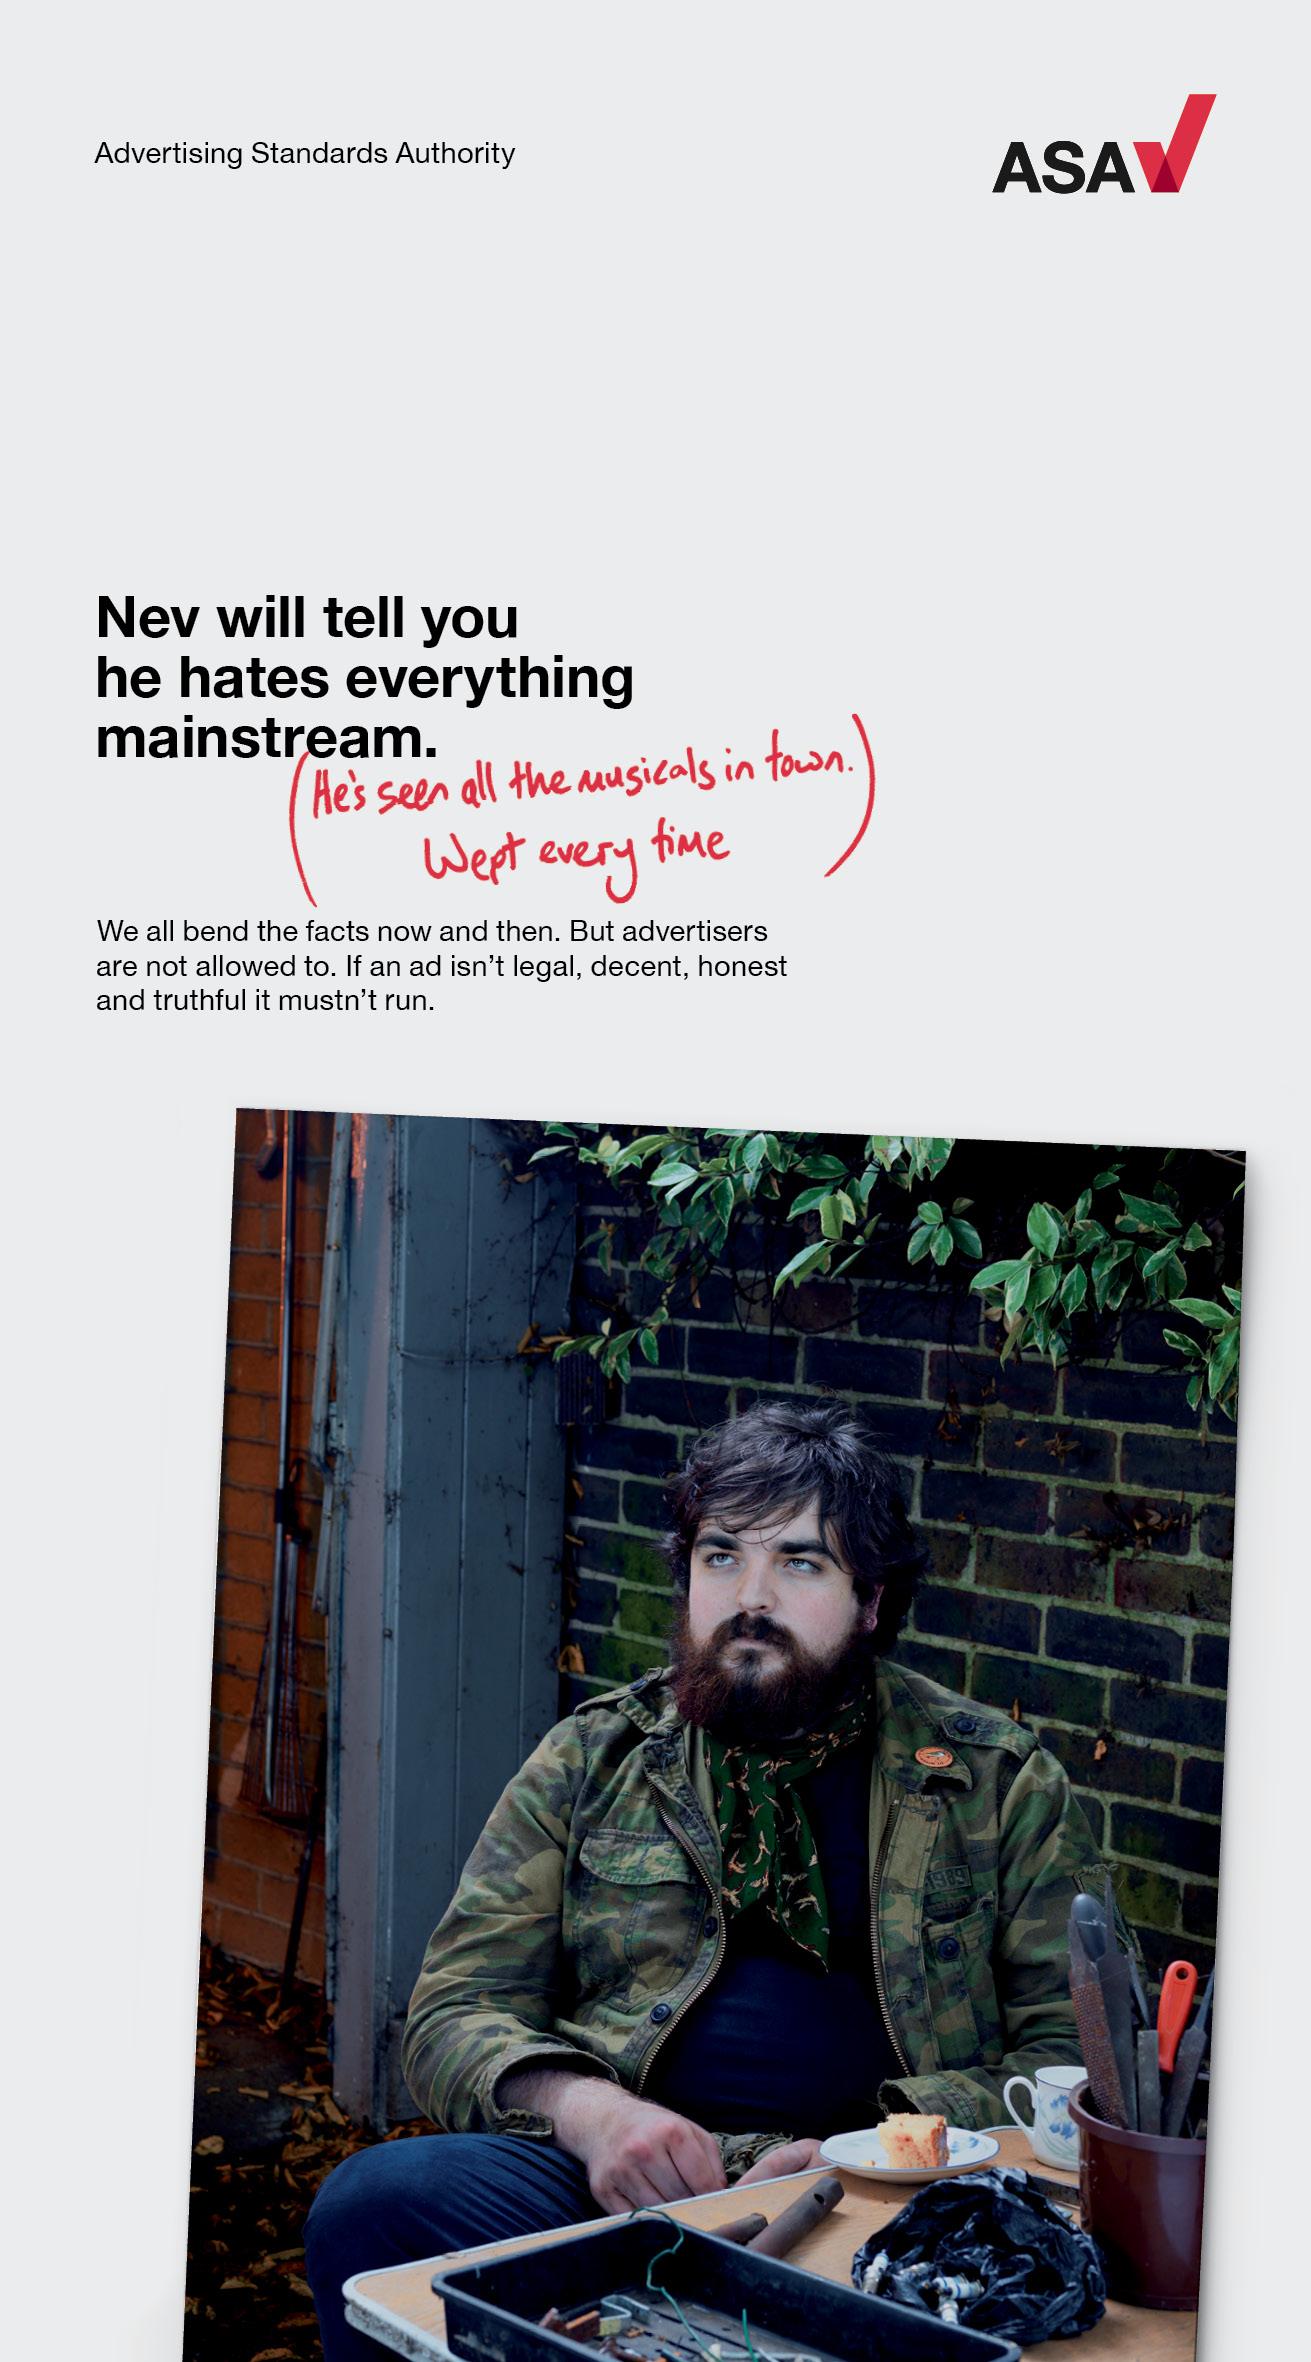 Nev ASA ad campaign 2015.jpg